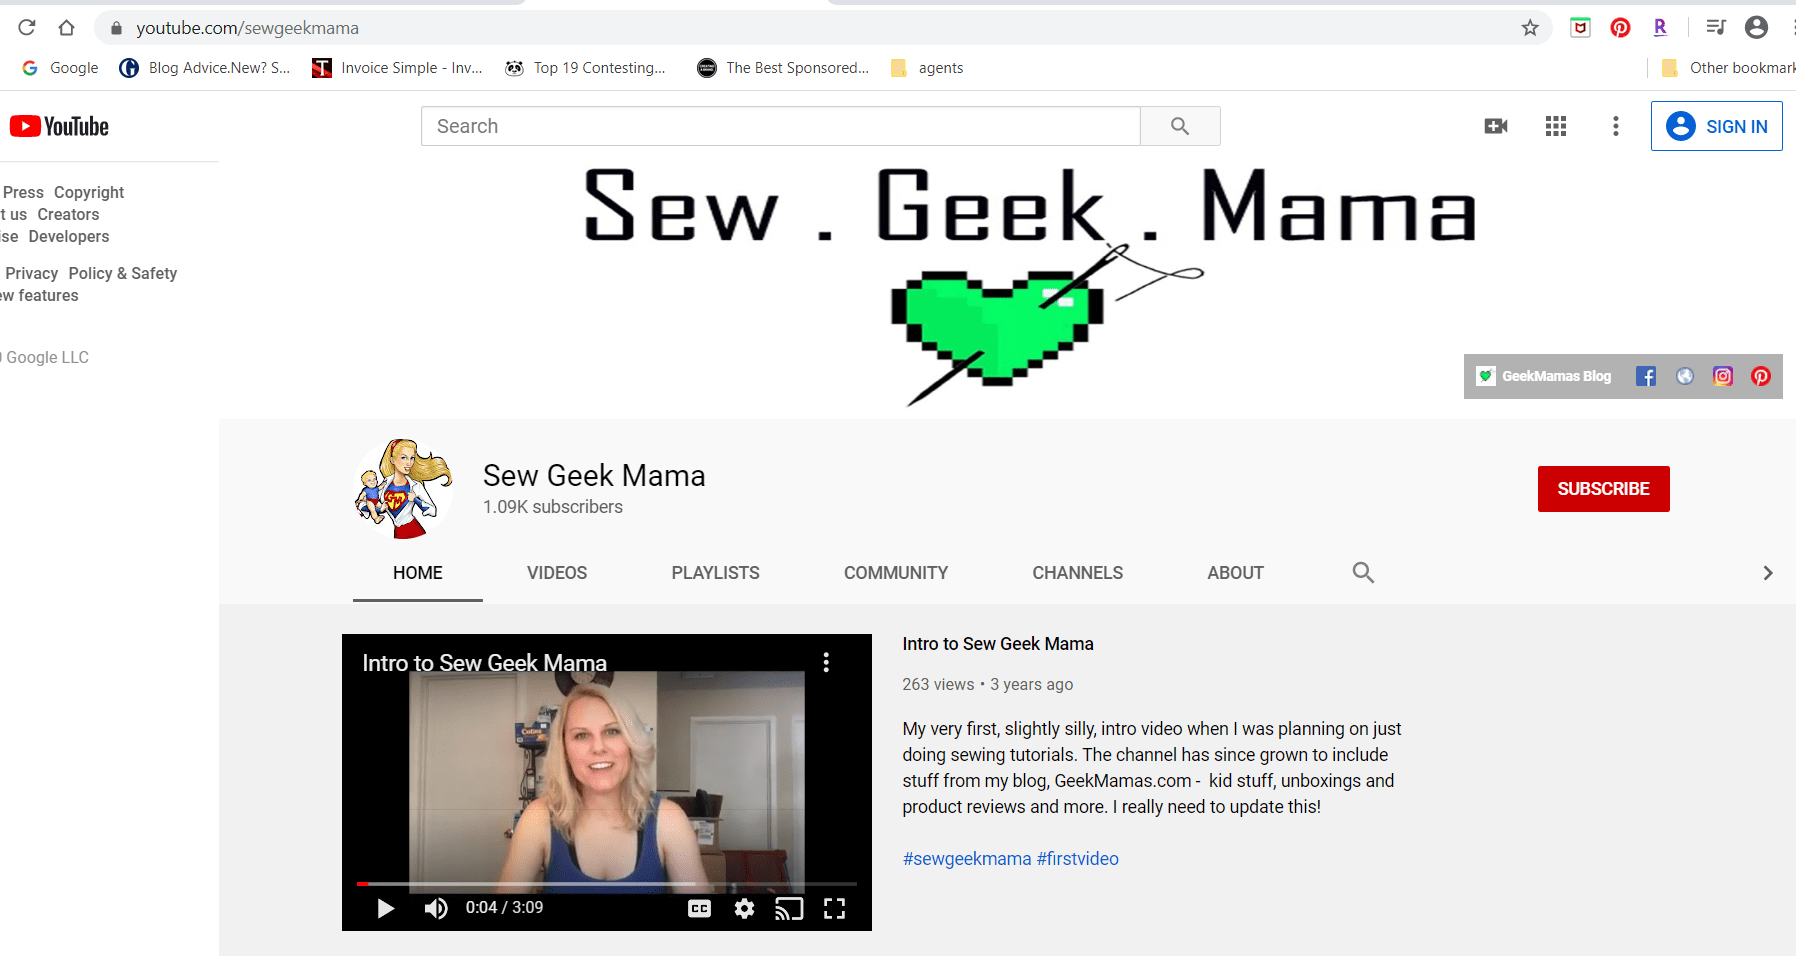 SewGeekMama Youtube Channel